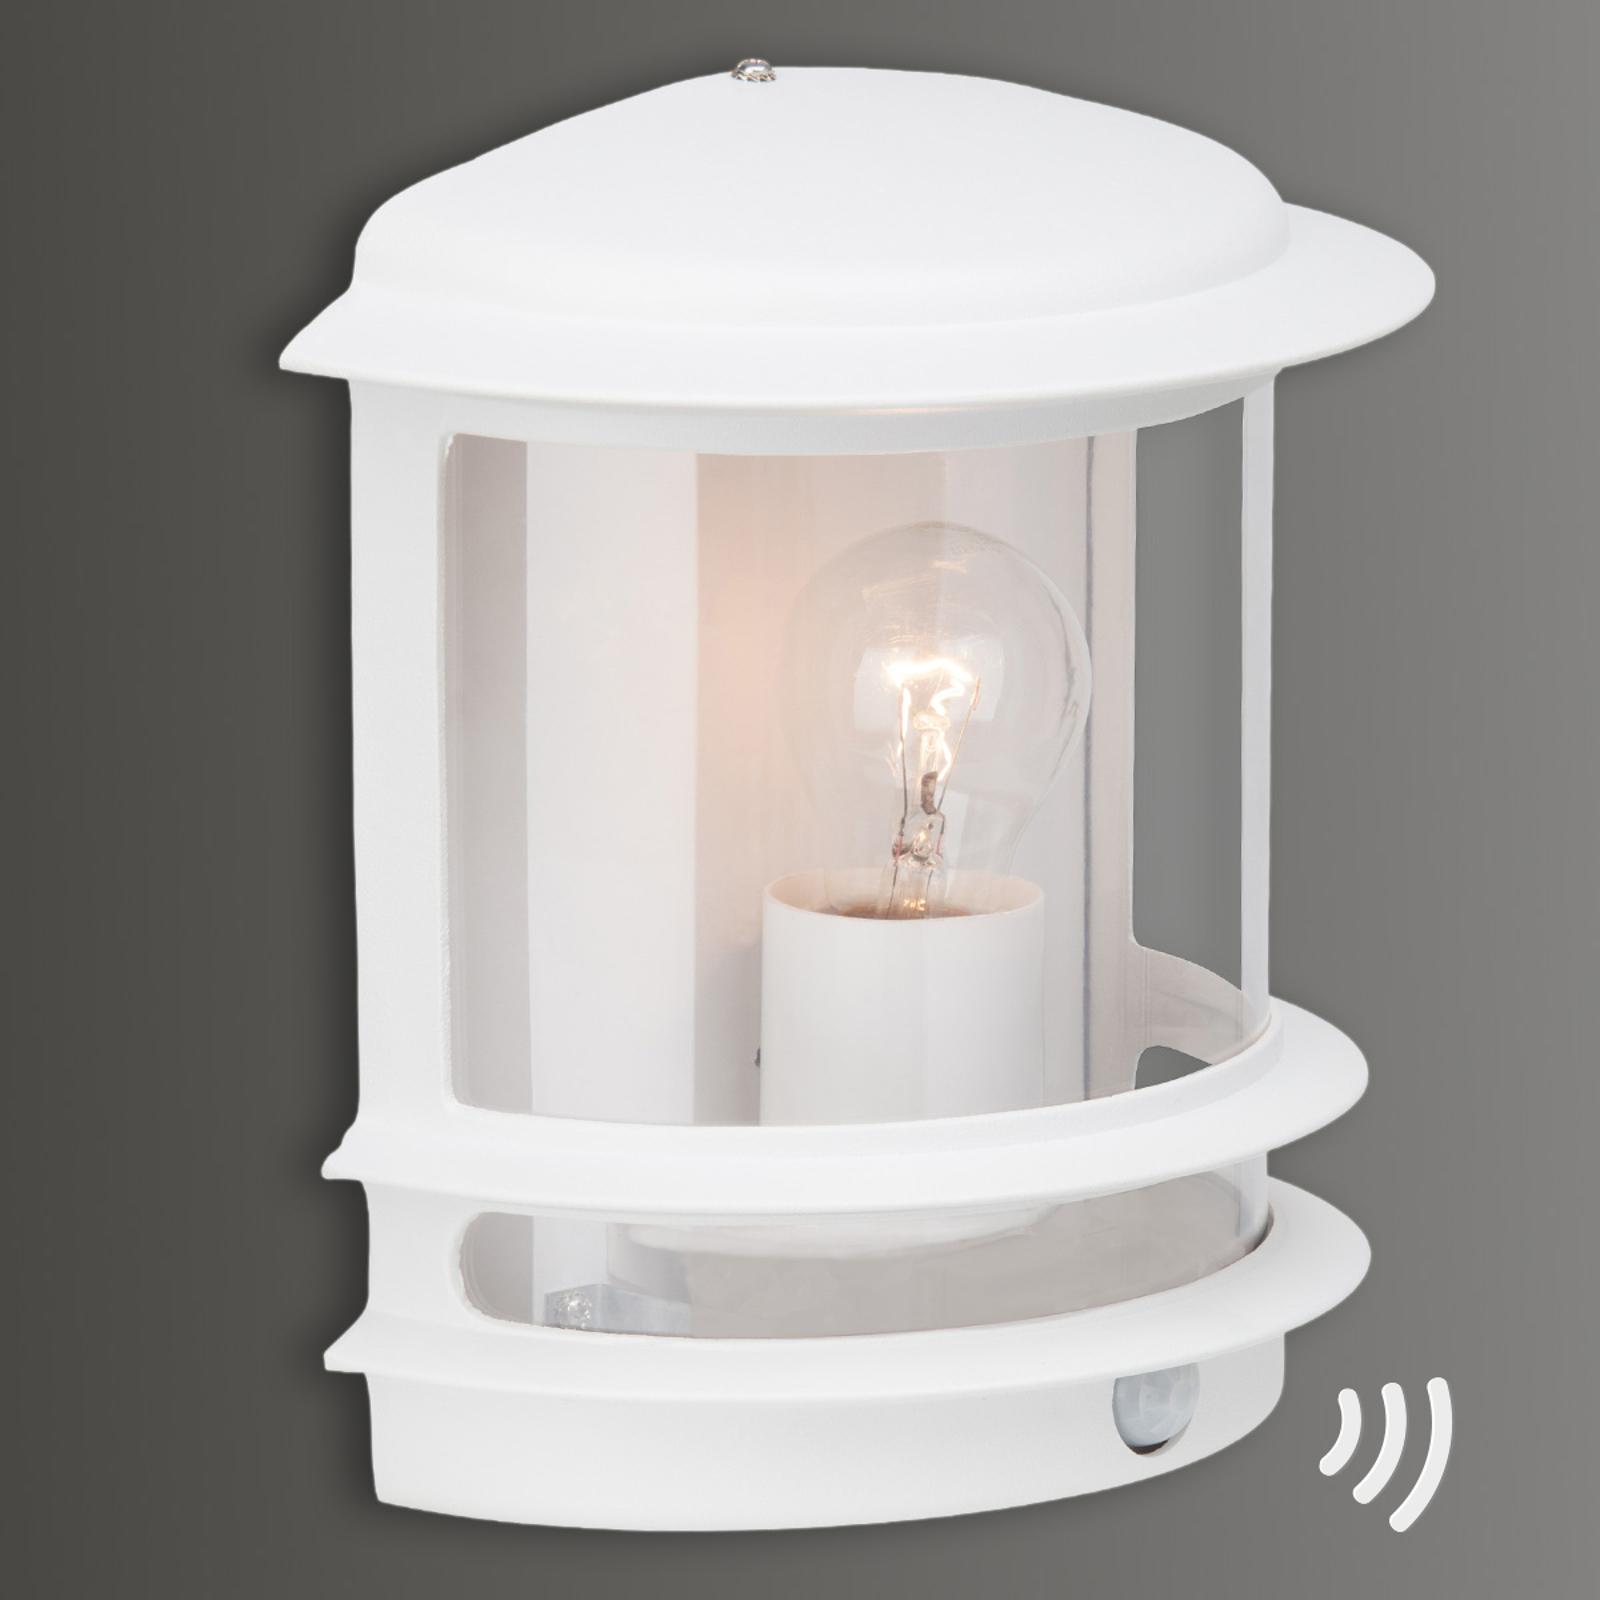 Met bewegingssensor - buitenwandlamp Hollywood